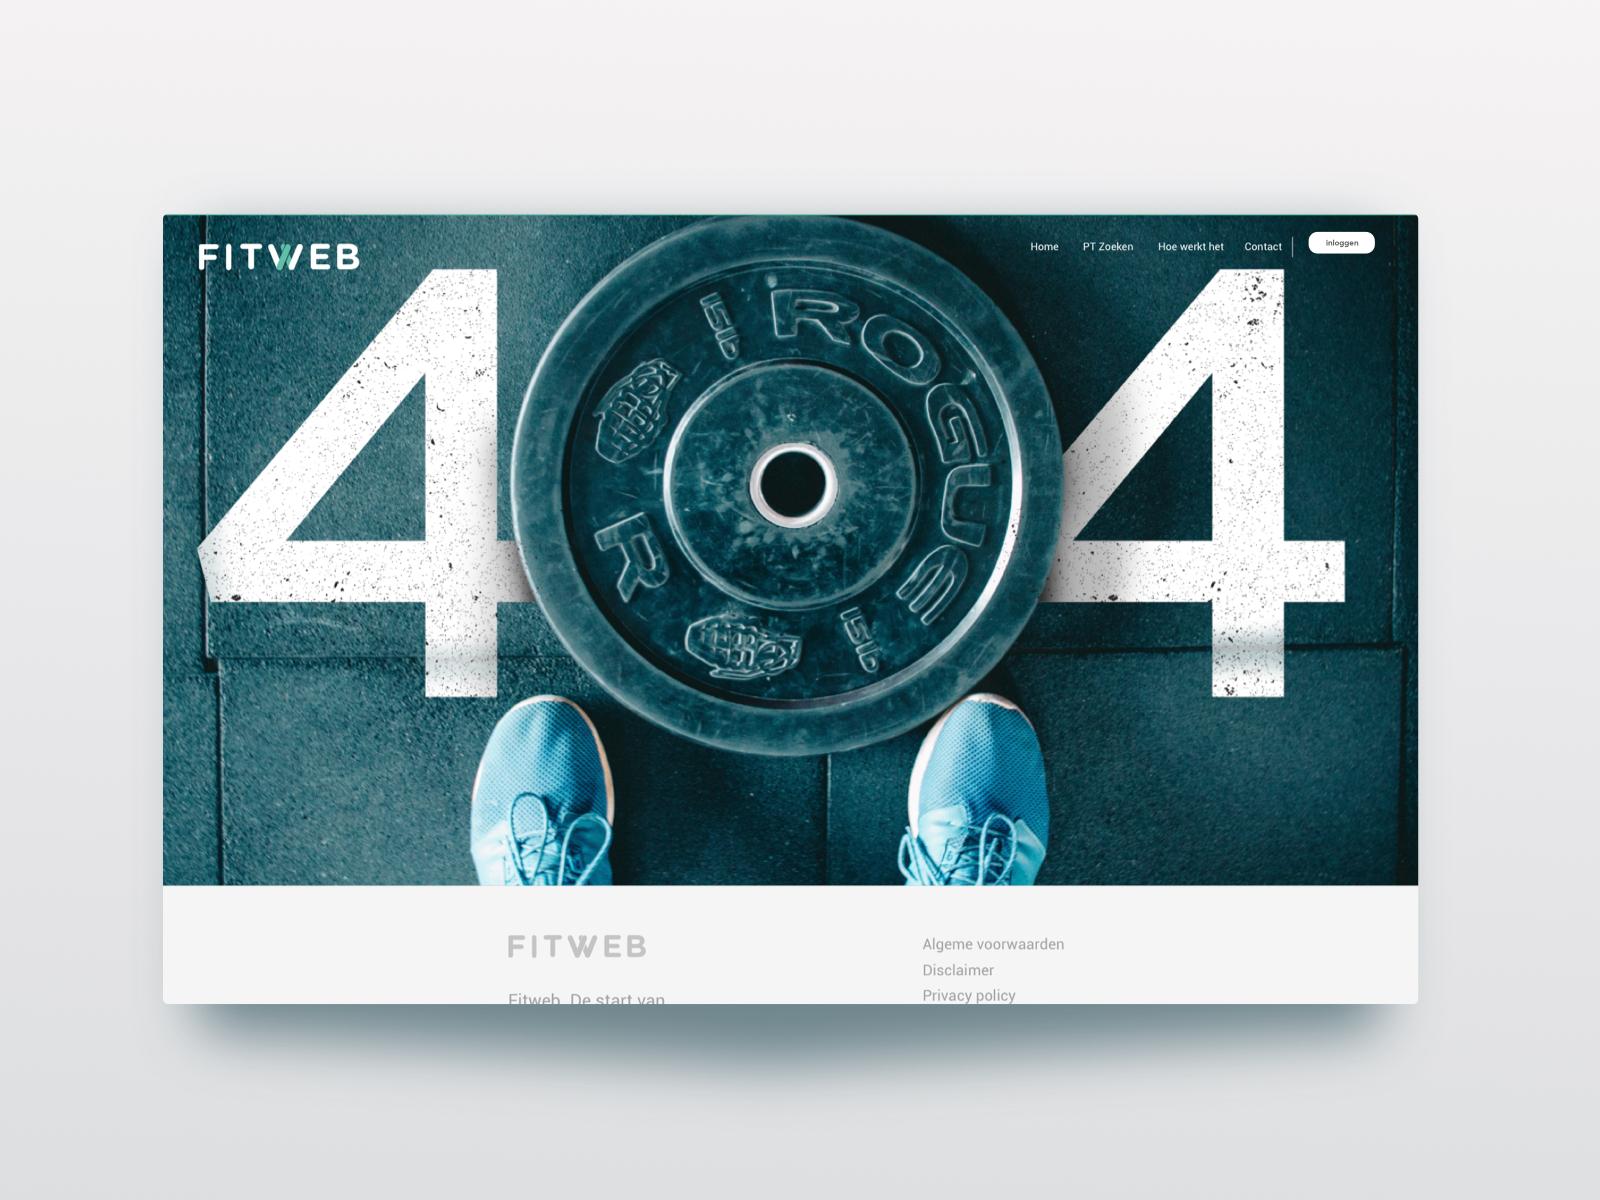 Fitweb 404 2